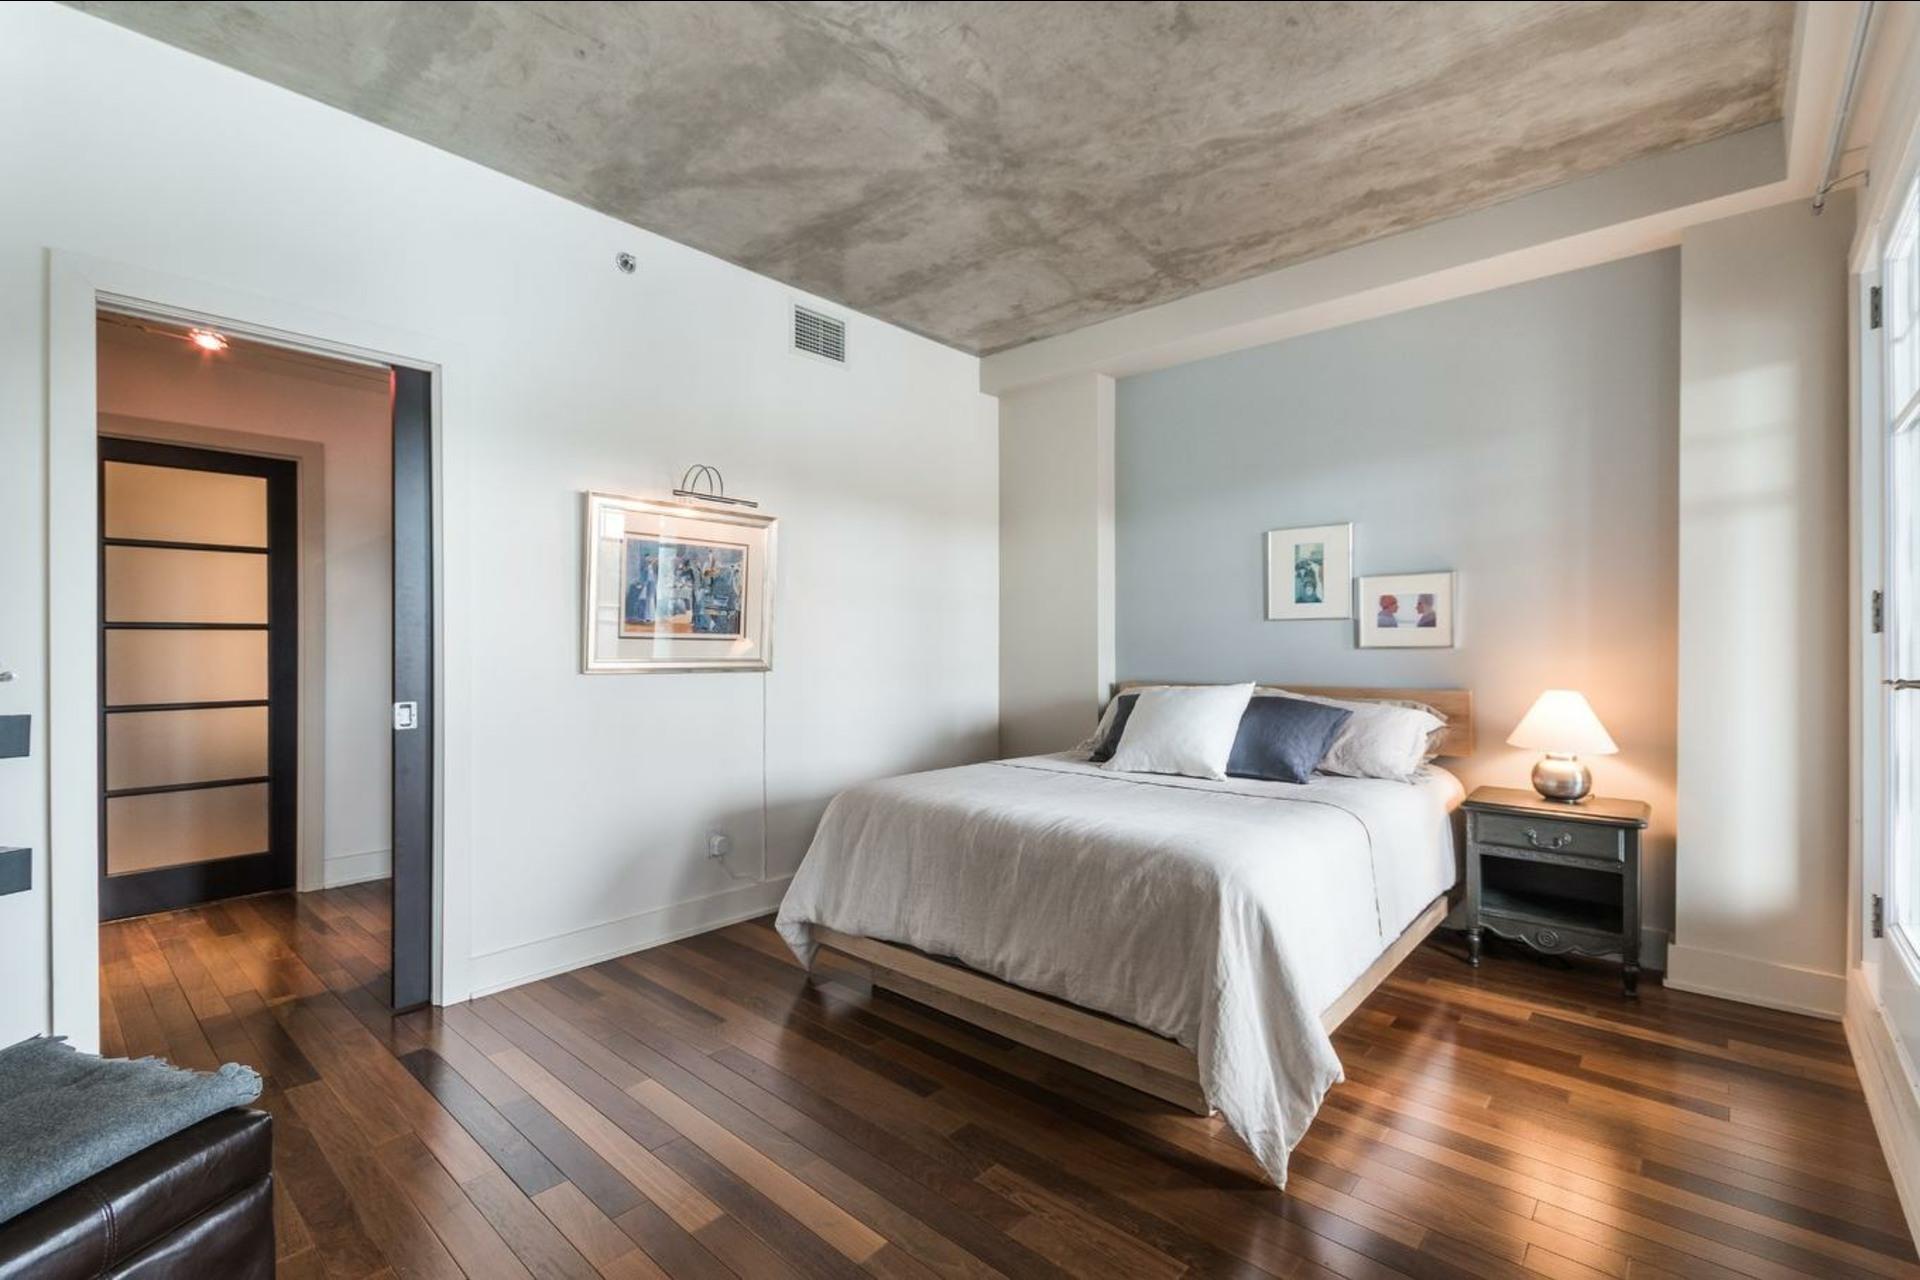 image 13 -  -  - Saint-Bruno-de-Montarville   - 7 室